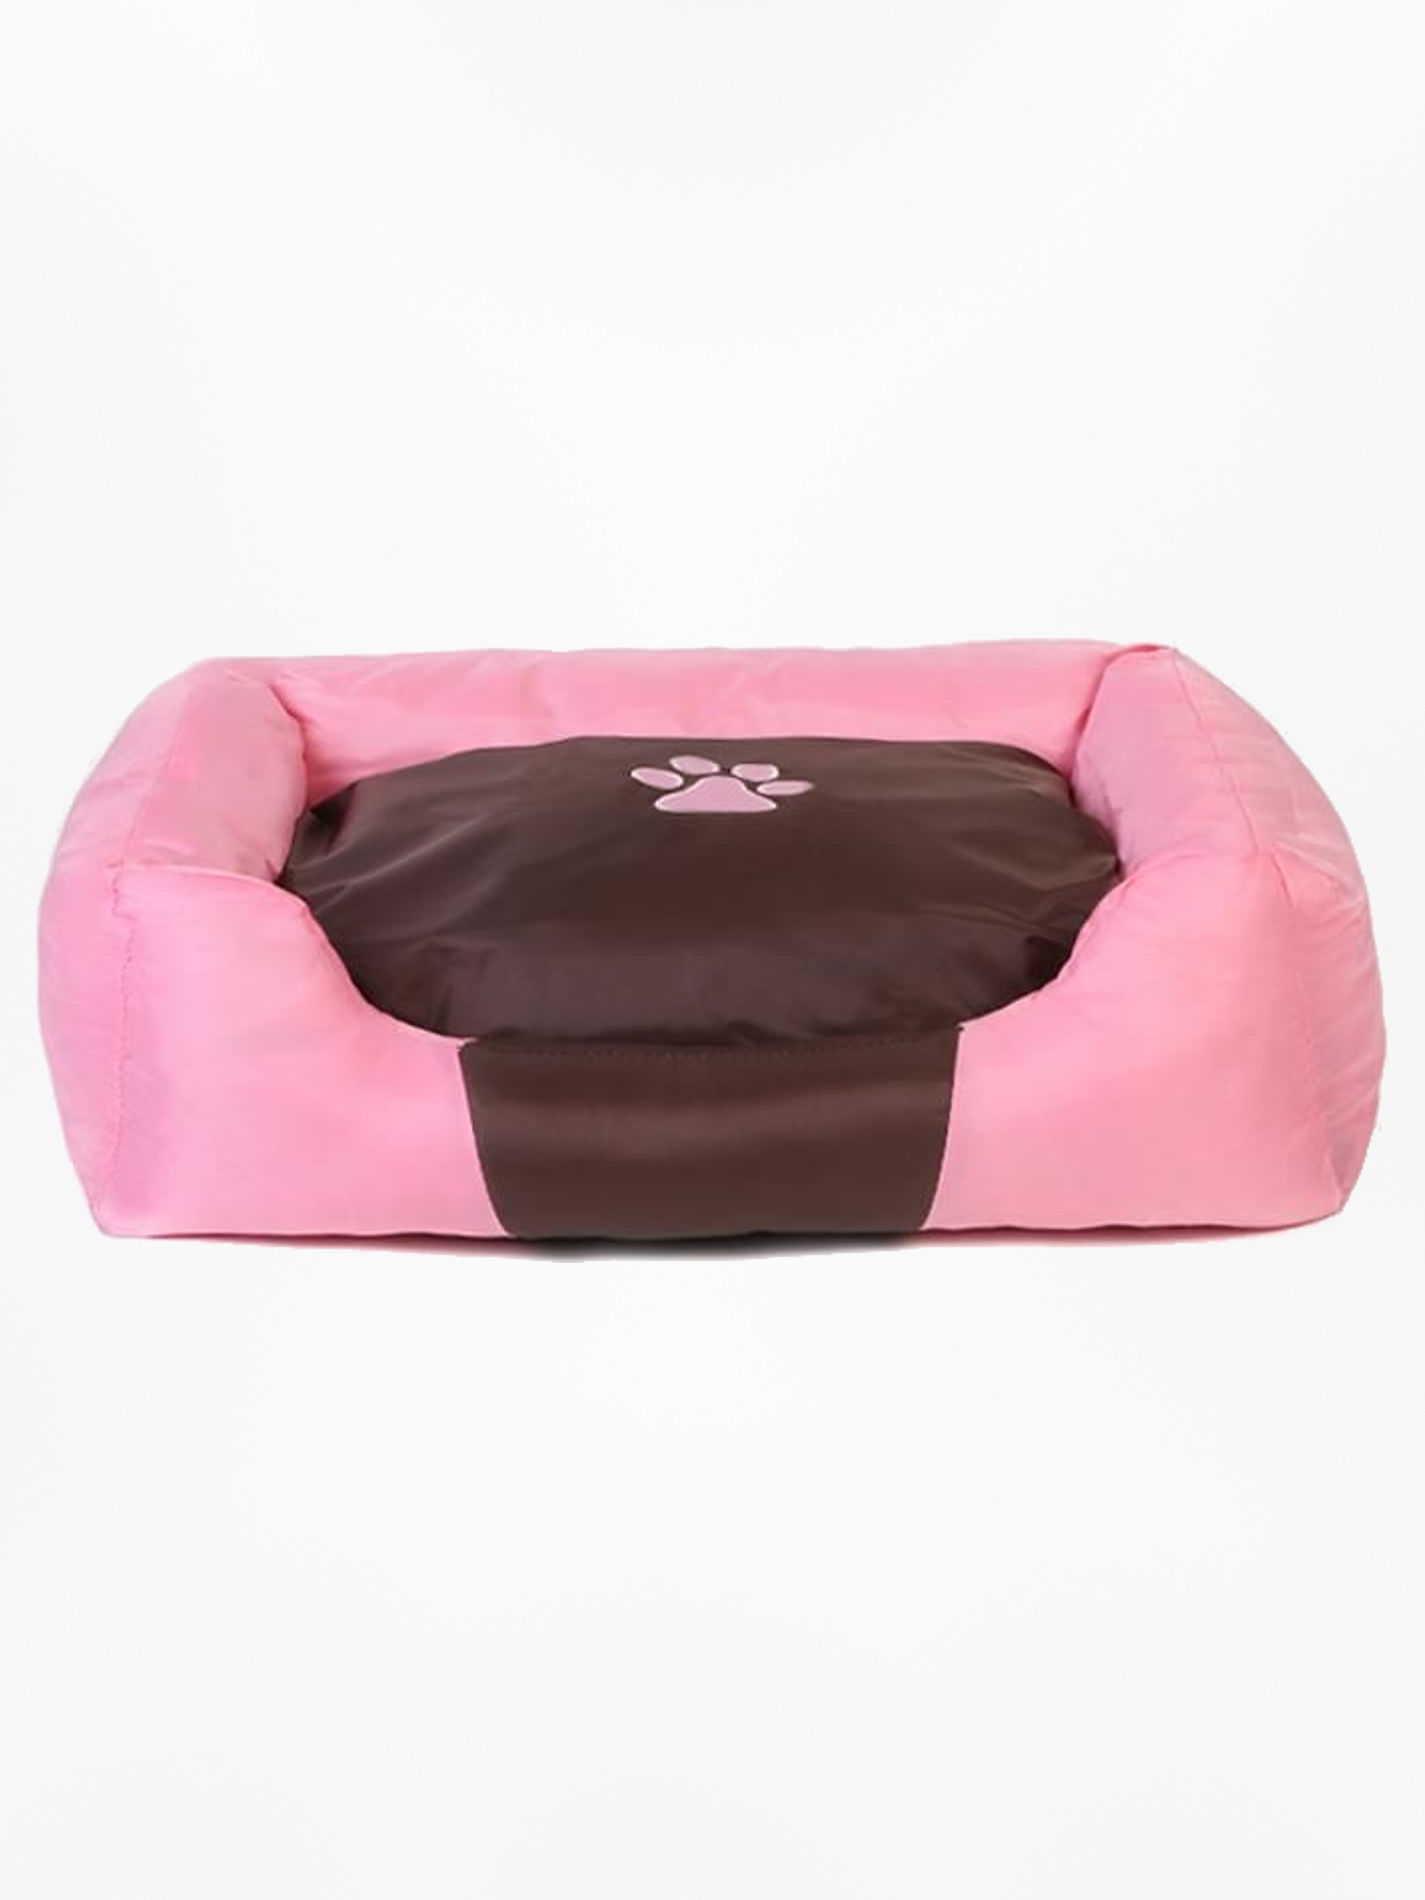 Hondenmand roze